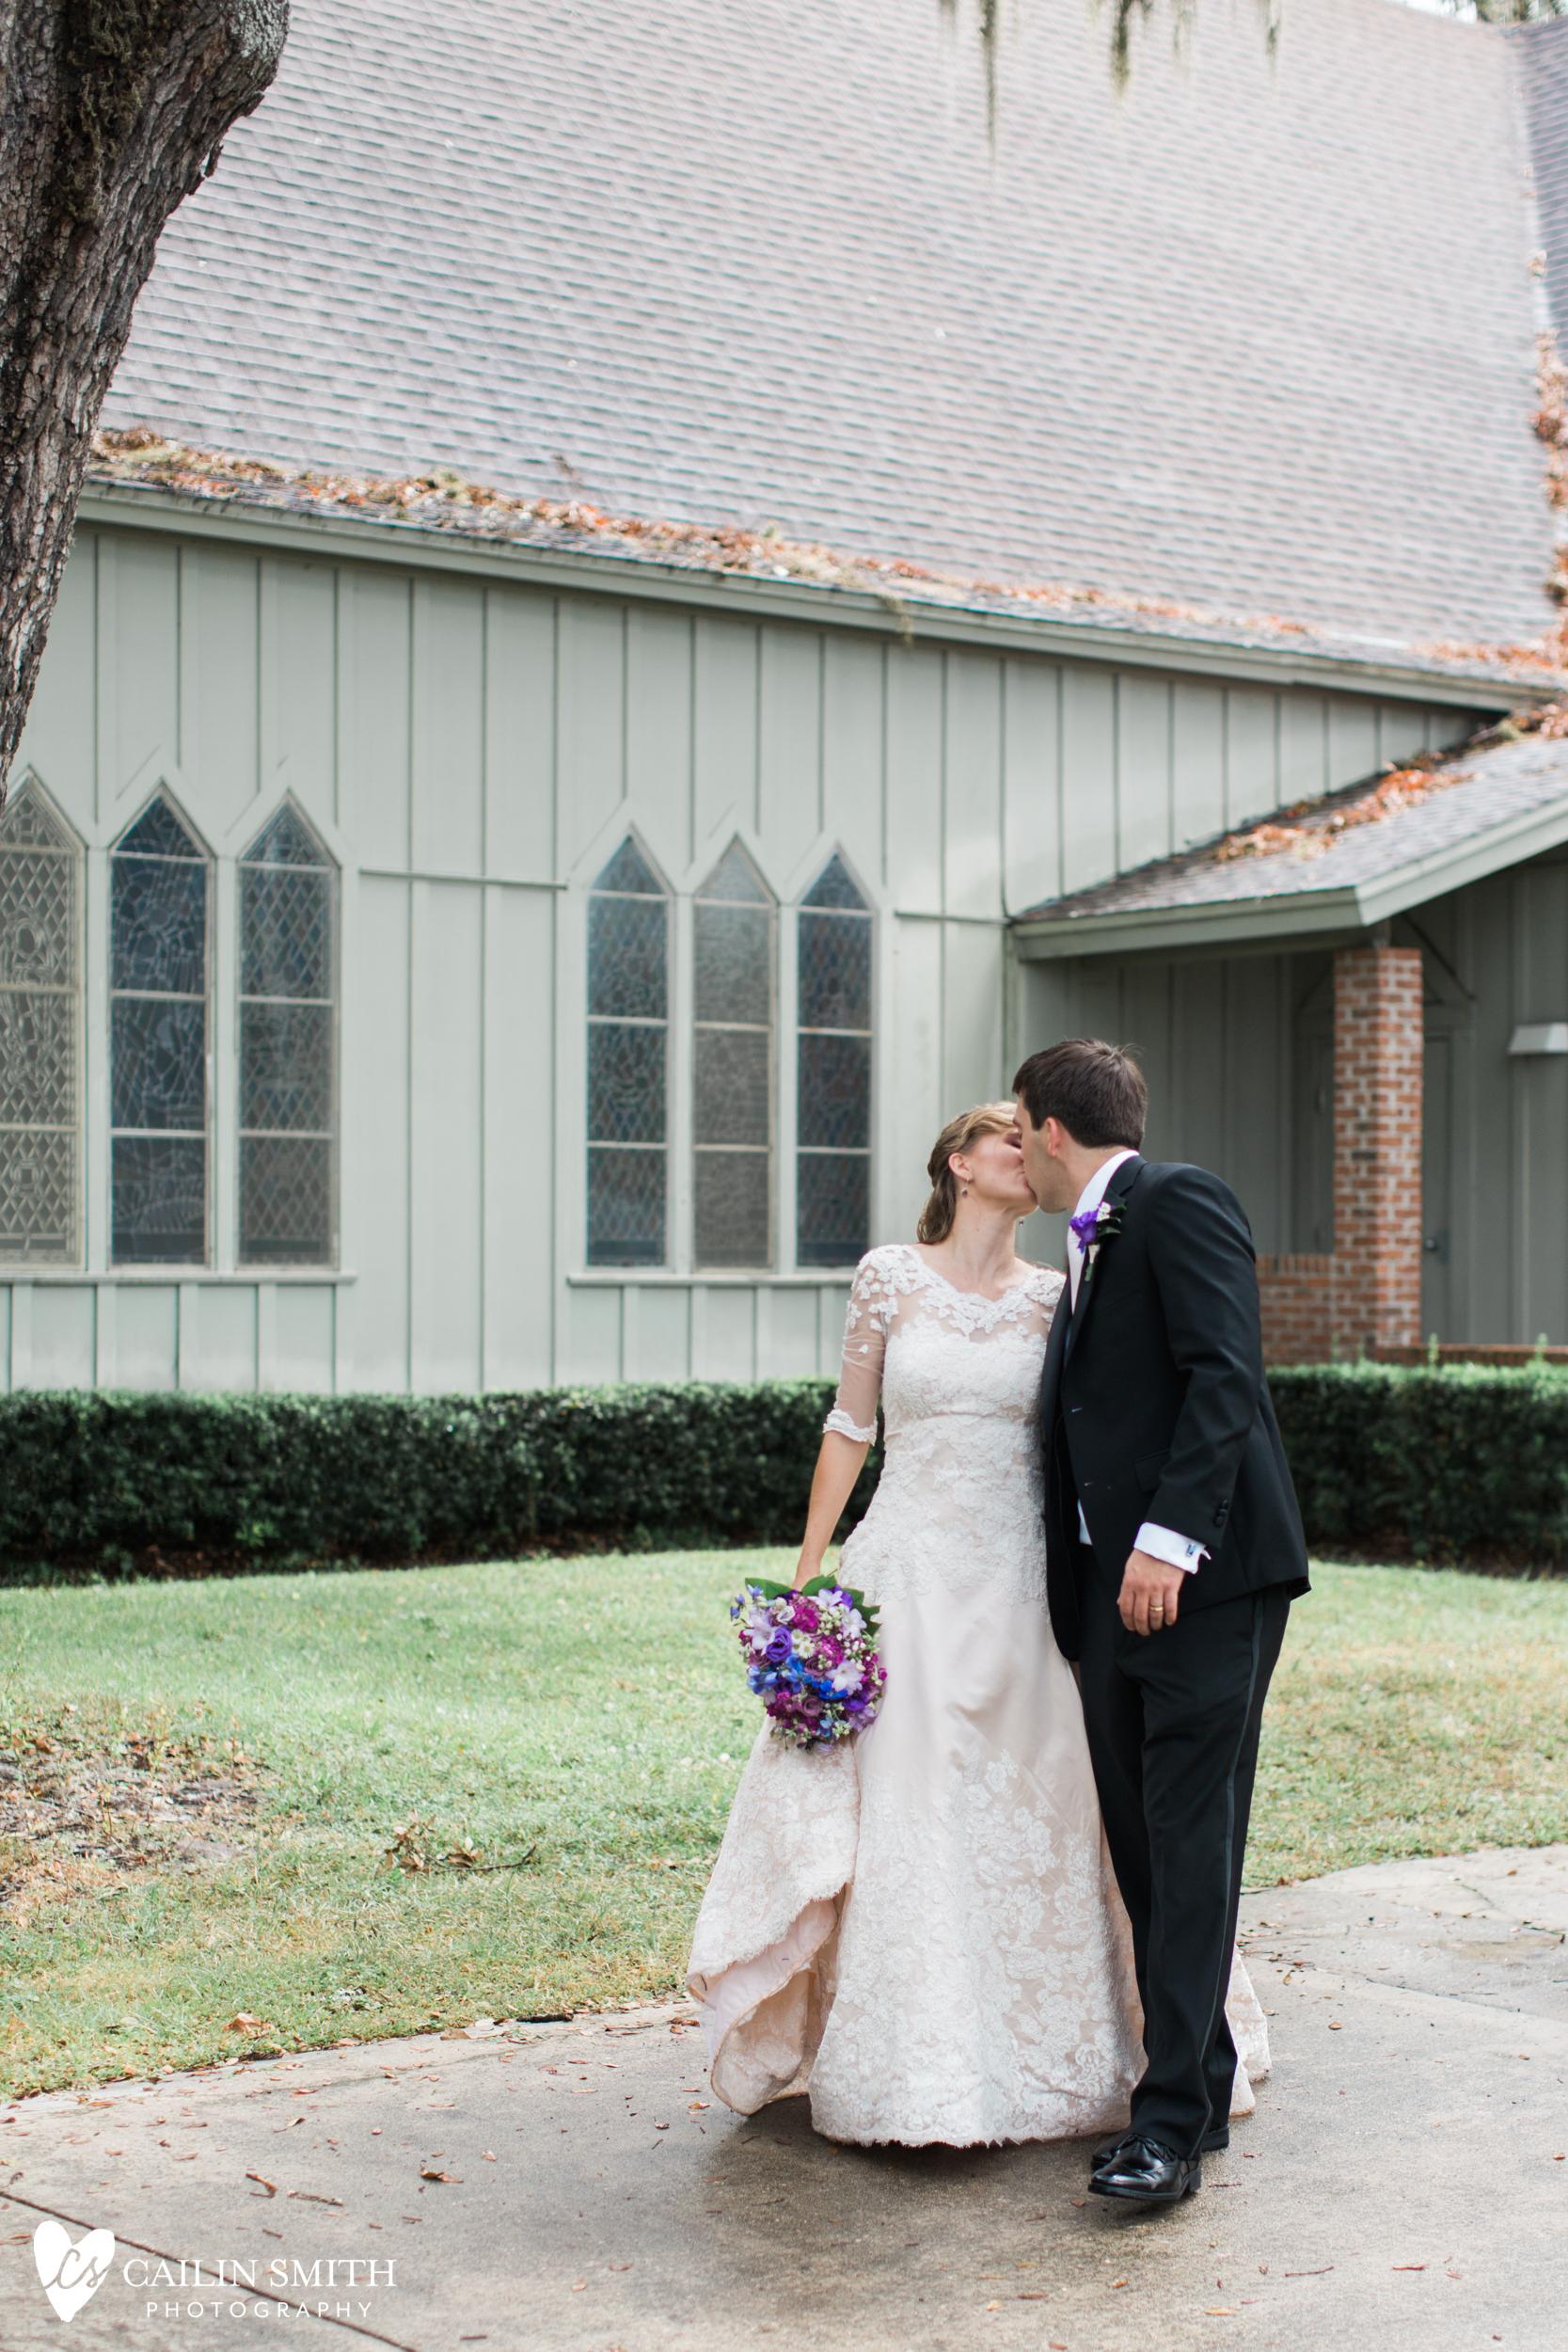 Shannon_David_Grace_Episcopal_Church_Wedding_photography_007.jpg